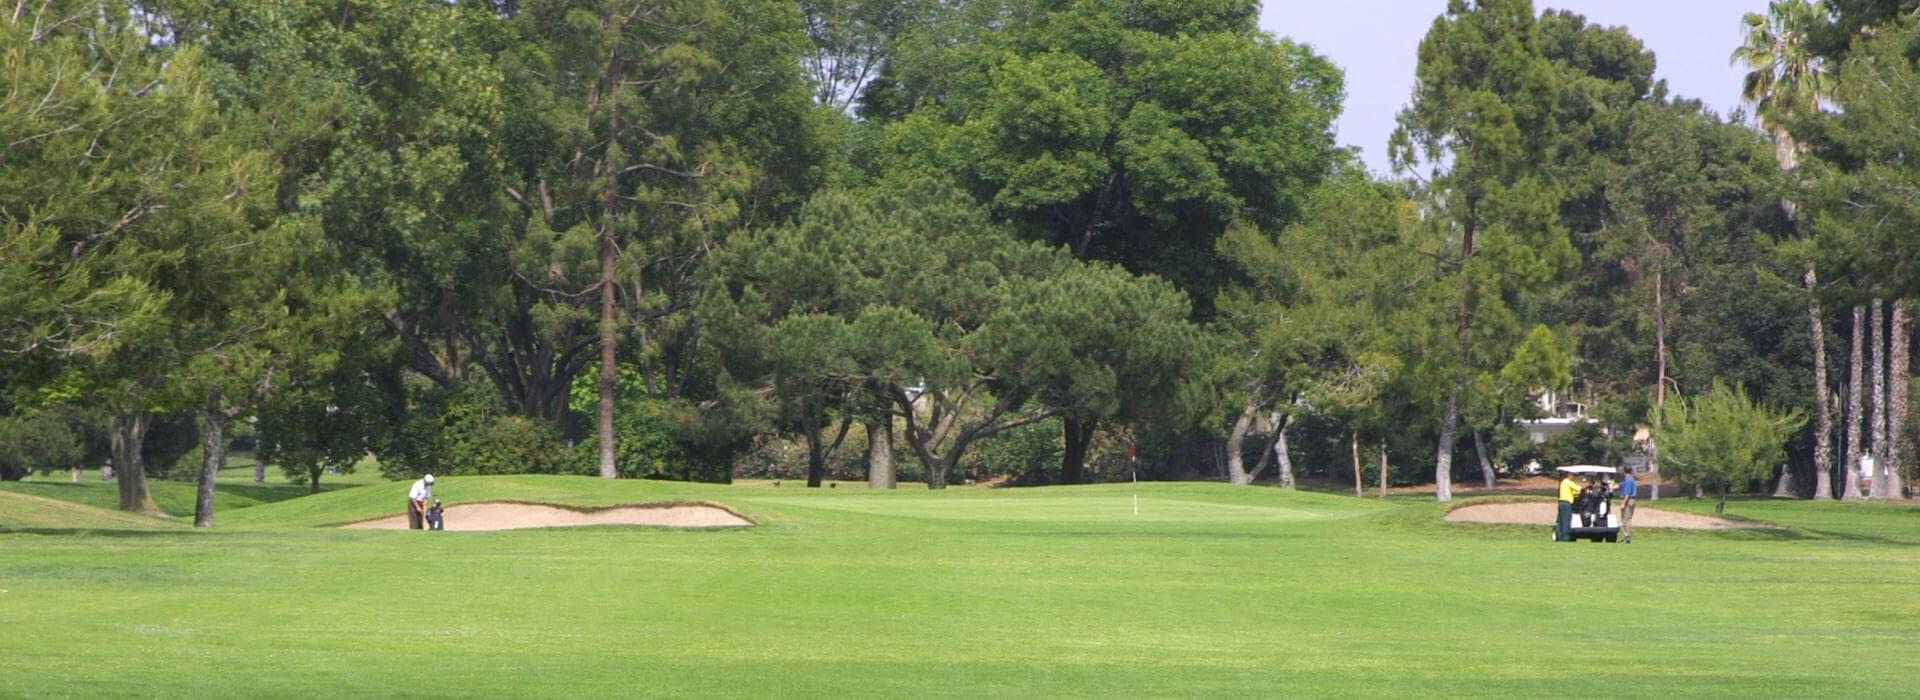 Dad Miller Golf Outing - Saturday, September 25, 2021